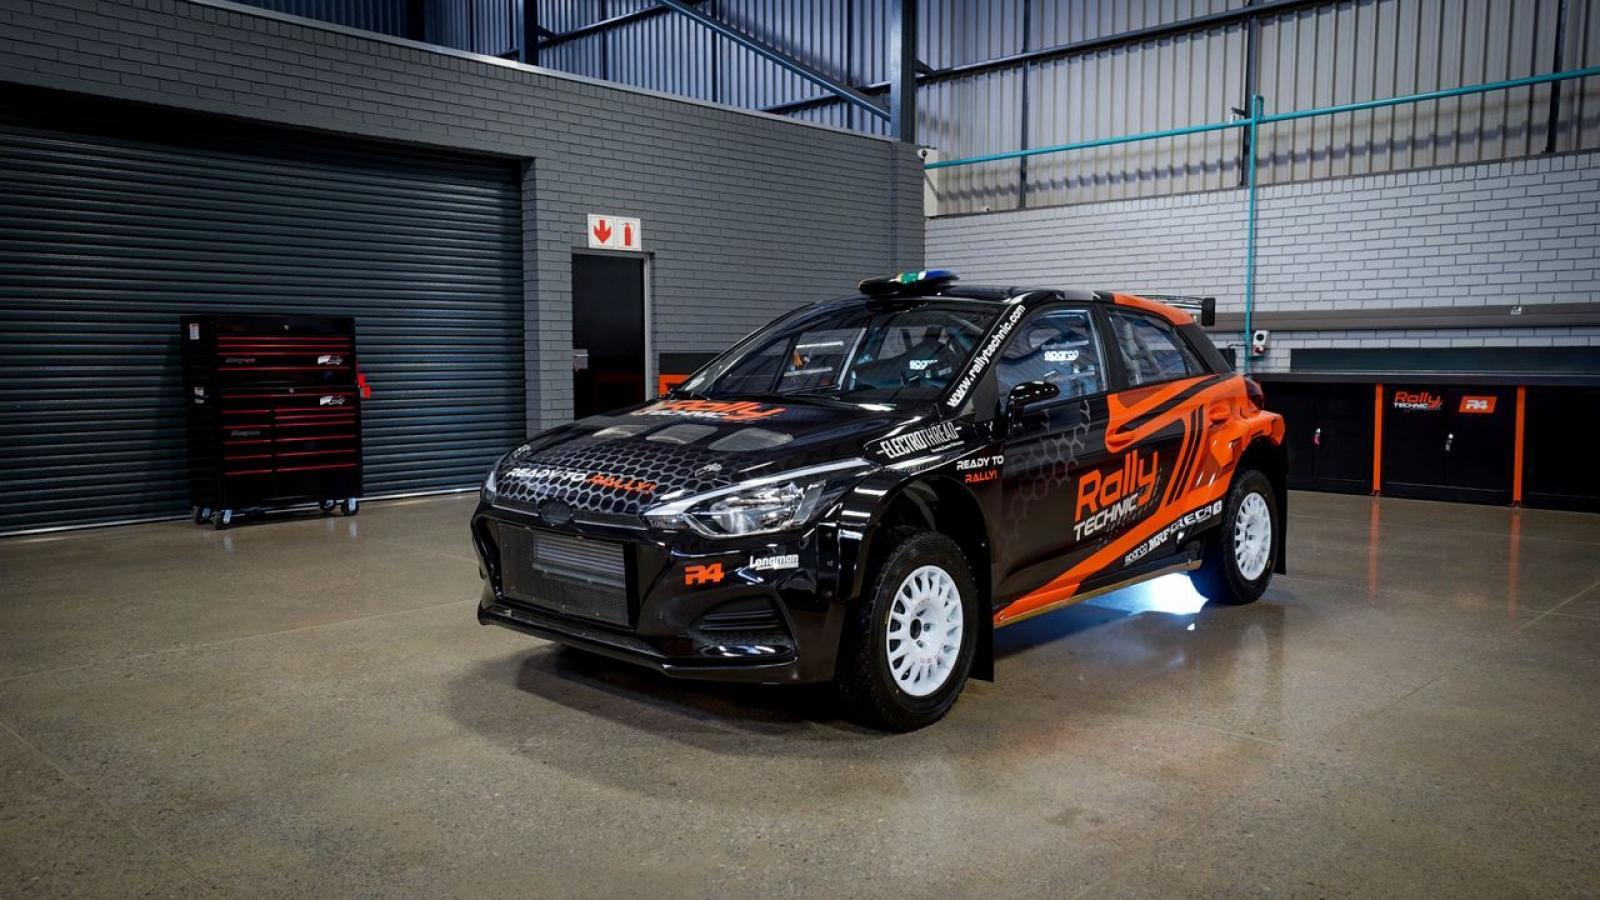 Hyundai I20 R4 (Rally2 Kit) - 1